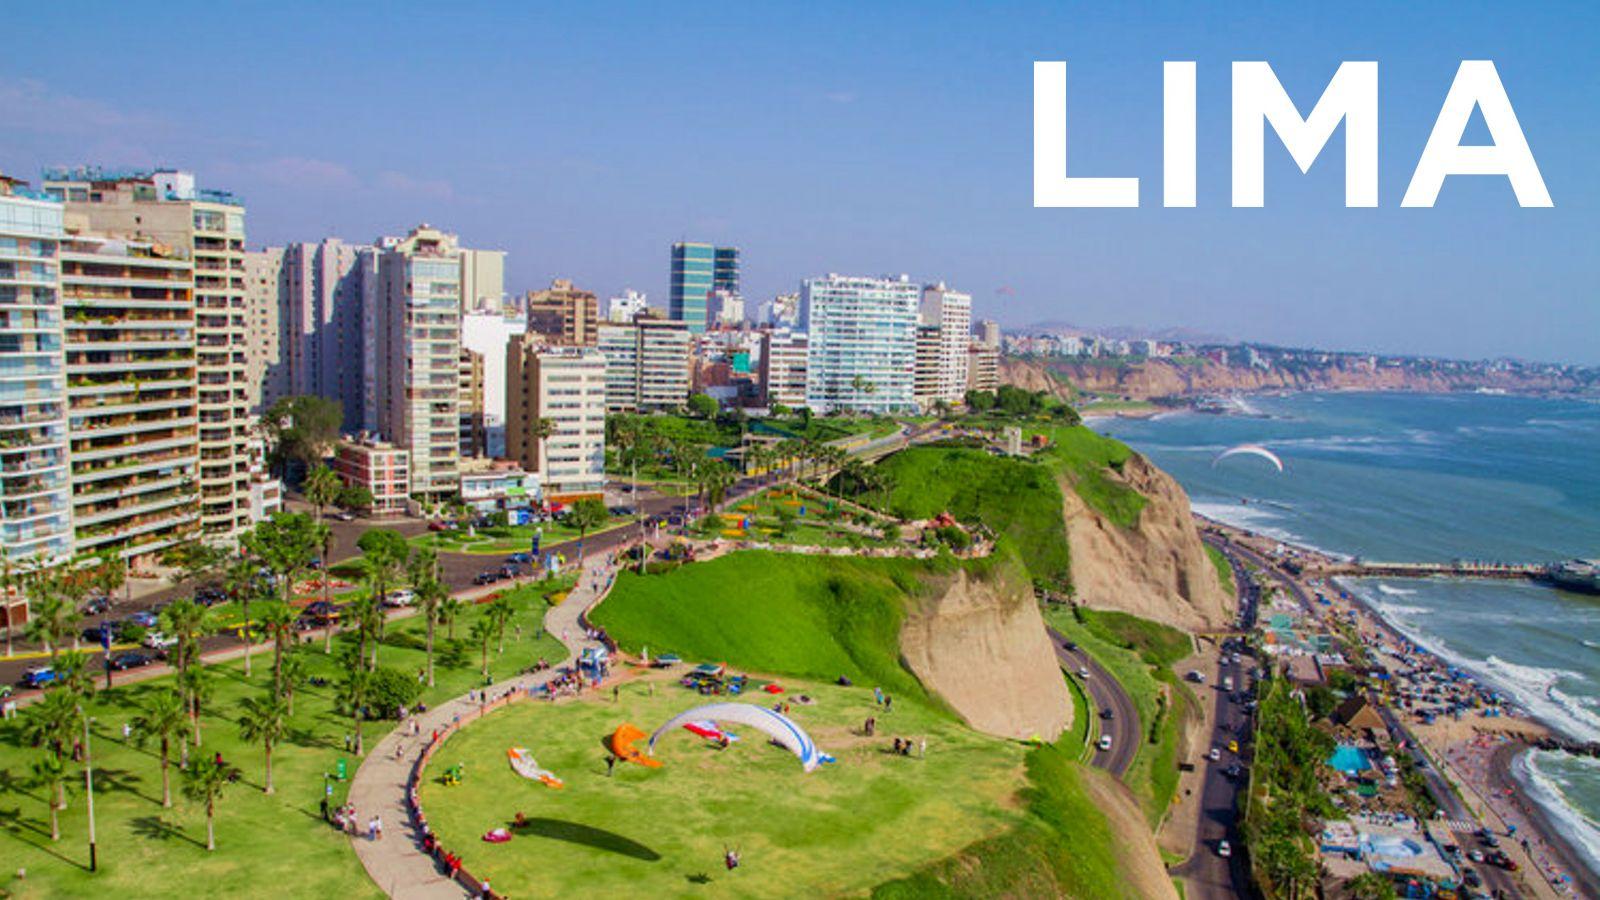 Voyage initiatique Lima Perou